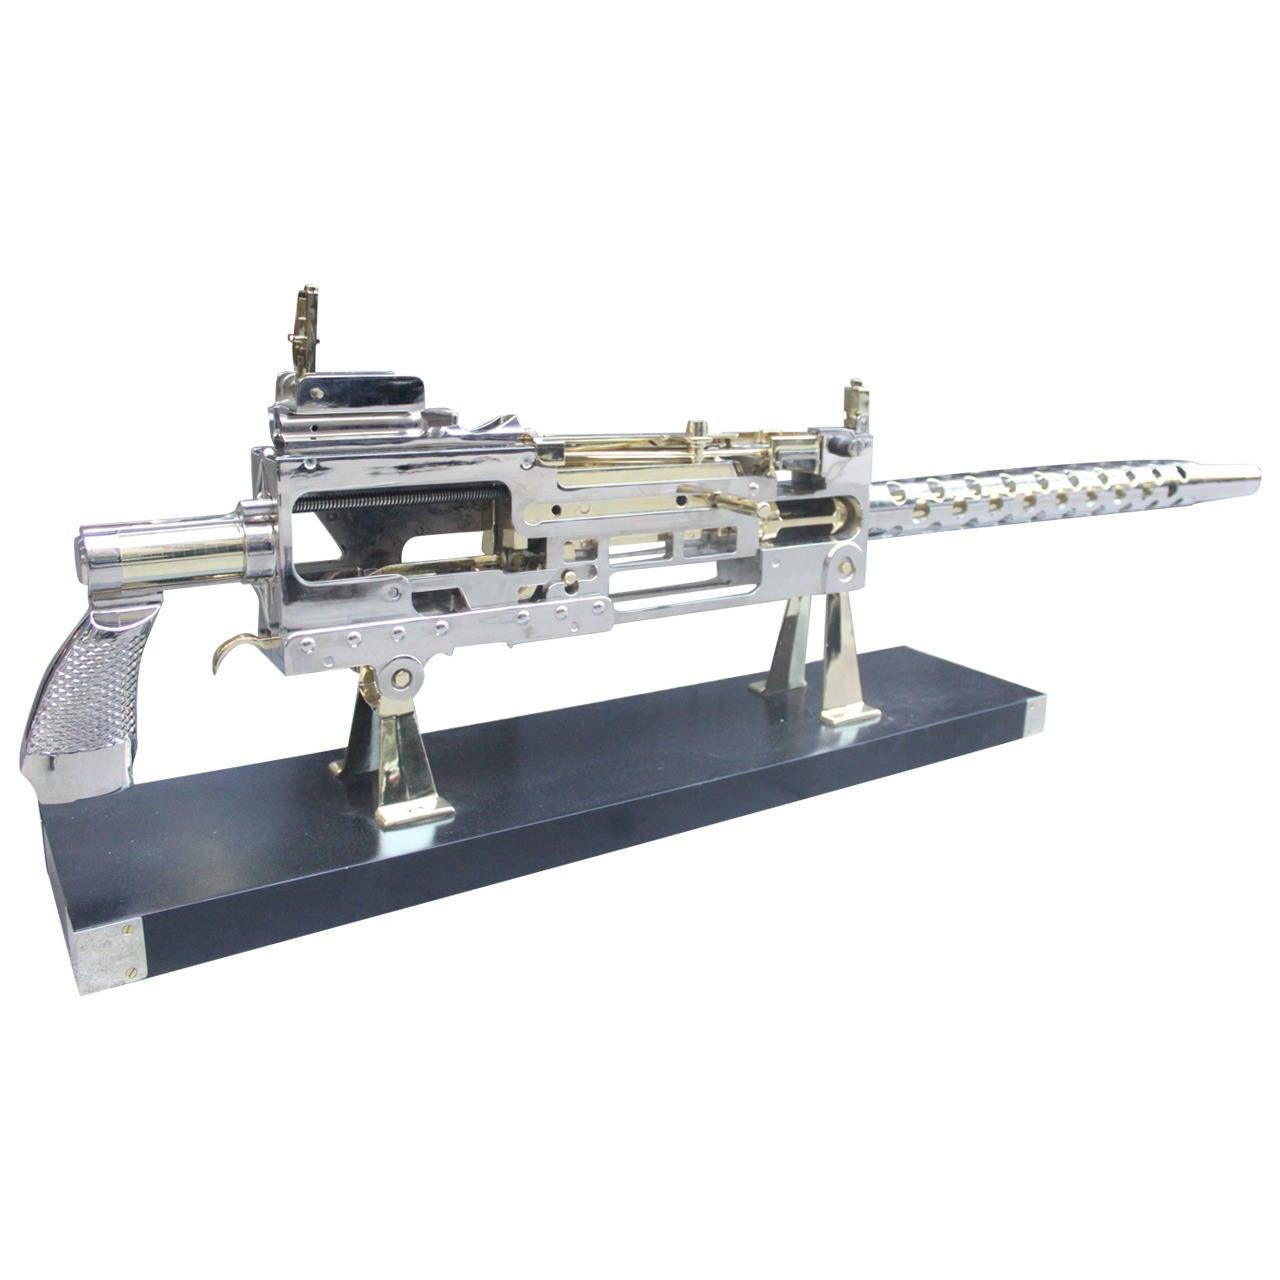 am 15 machine gun for sale